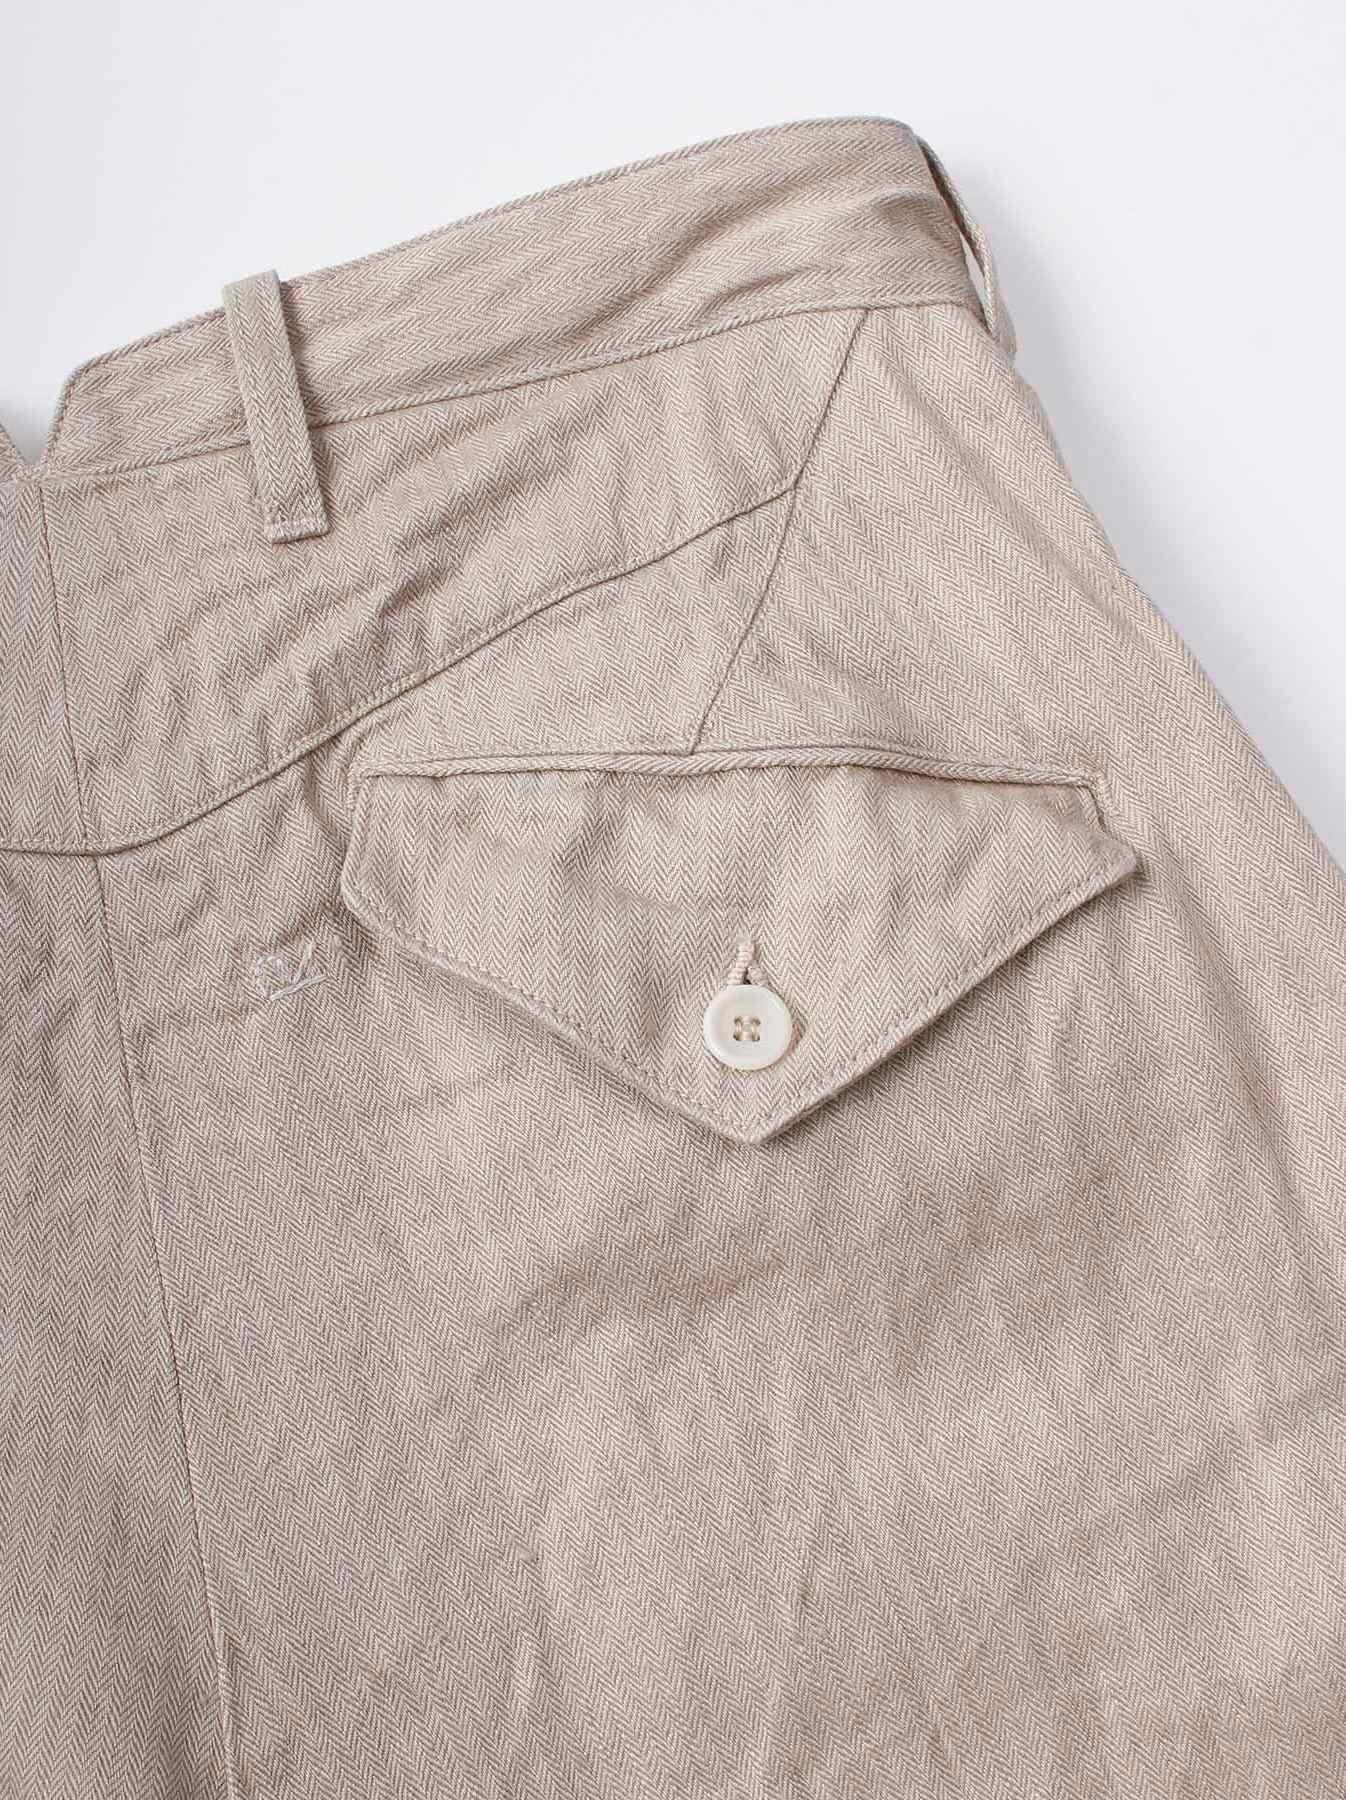 WH Linen Work3-3